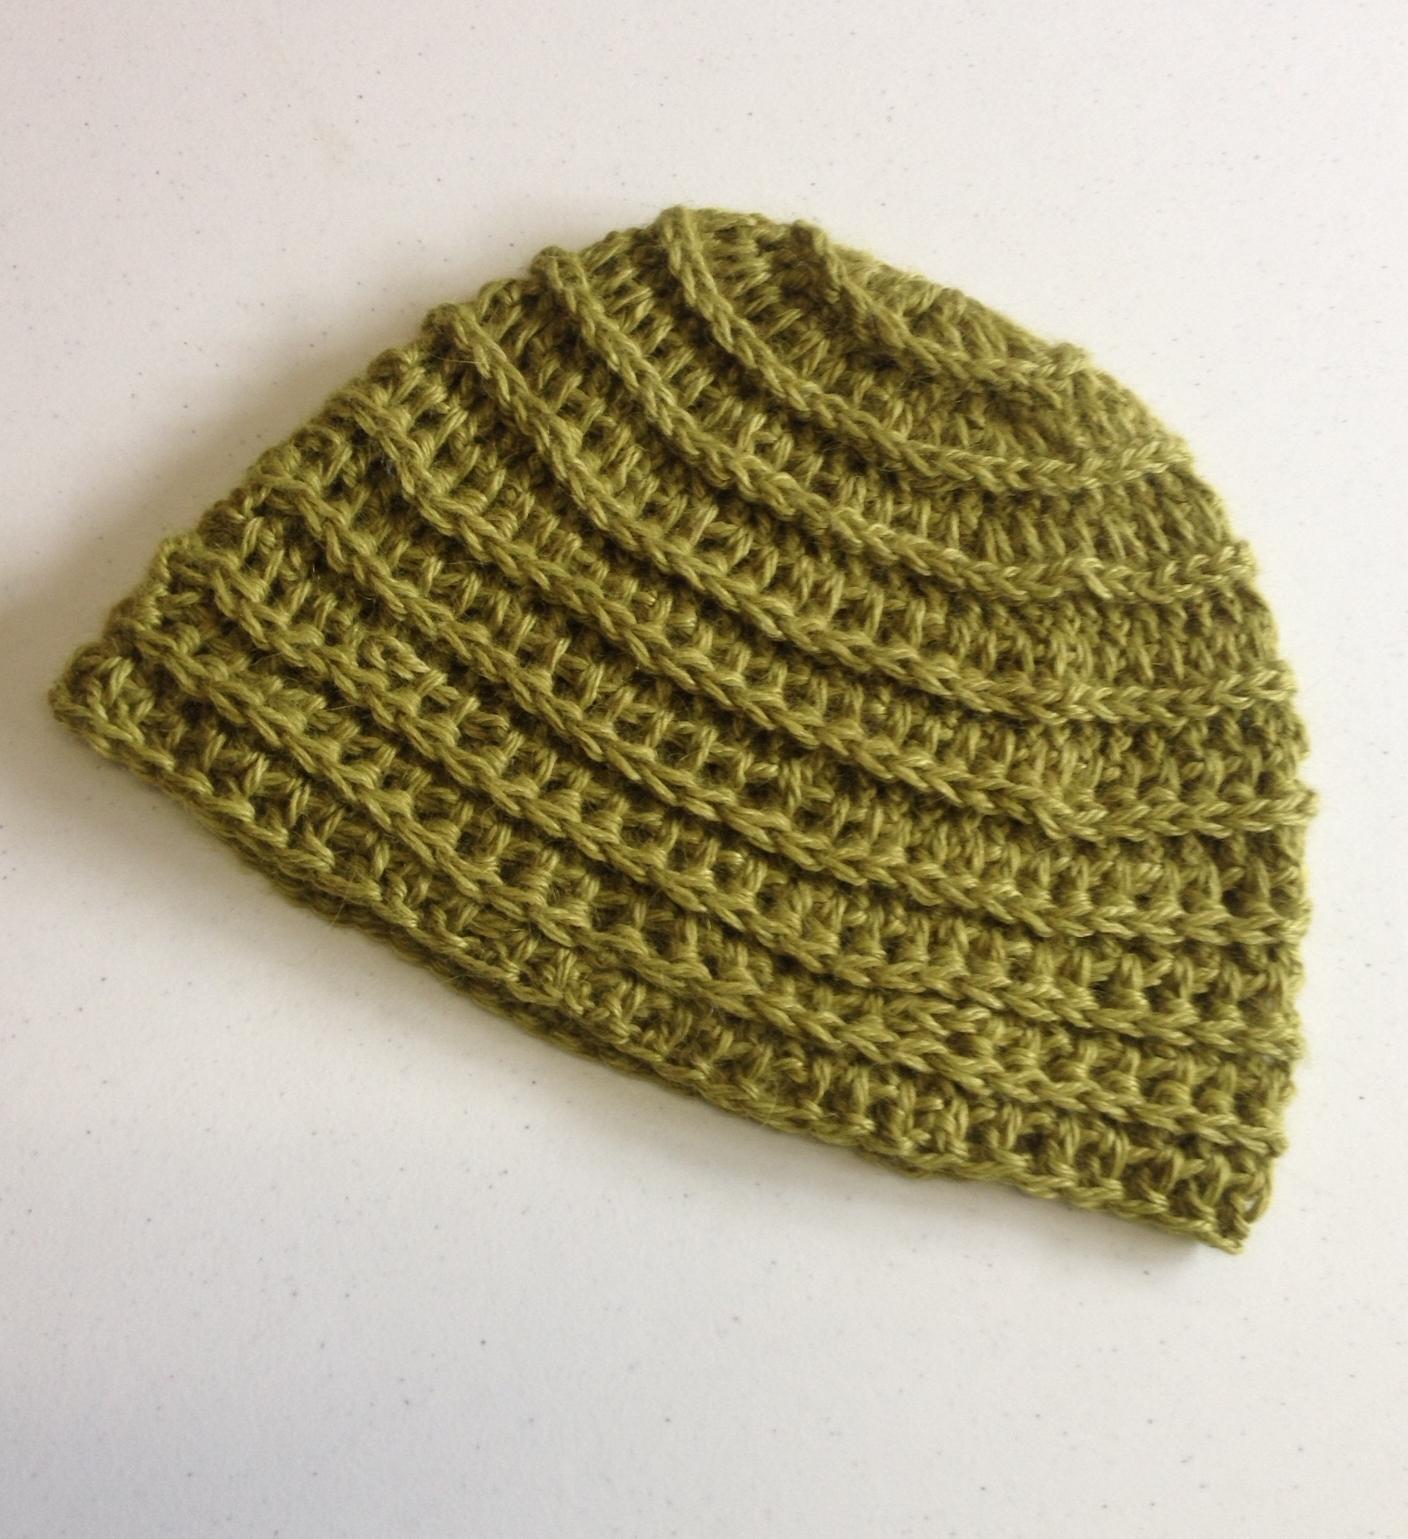 Limeaide Ridges Hat - Paca de Seda 00400